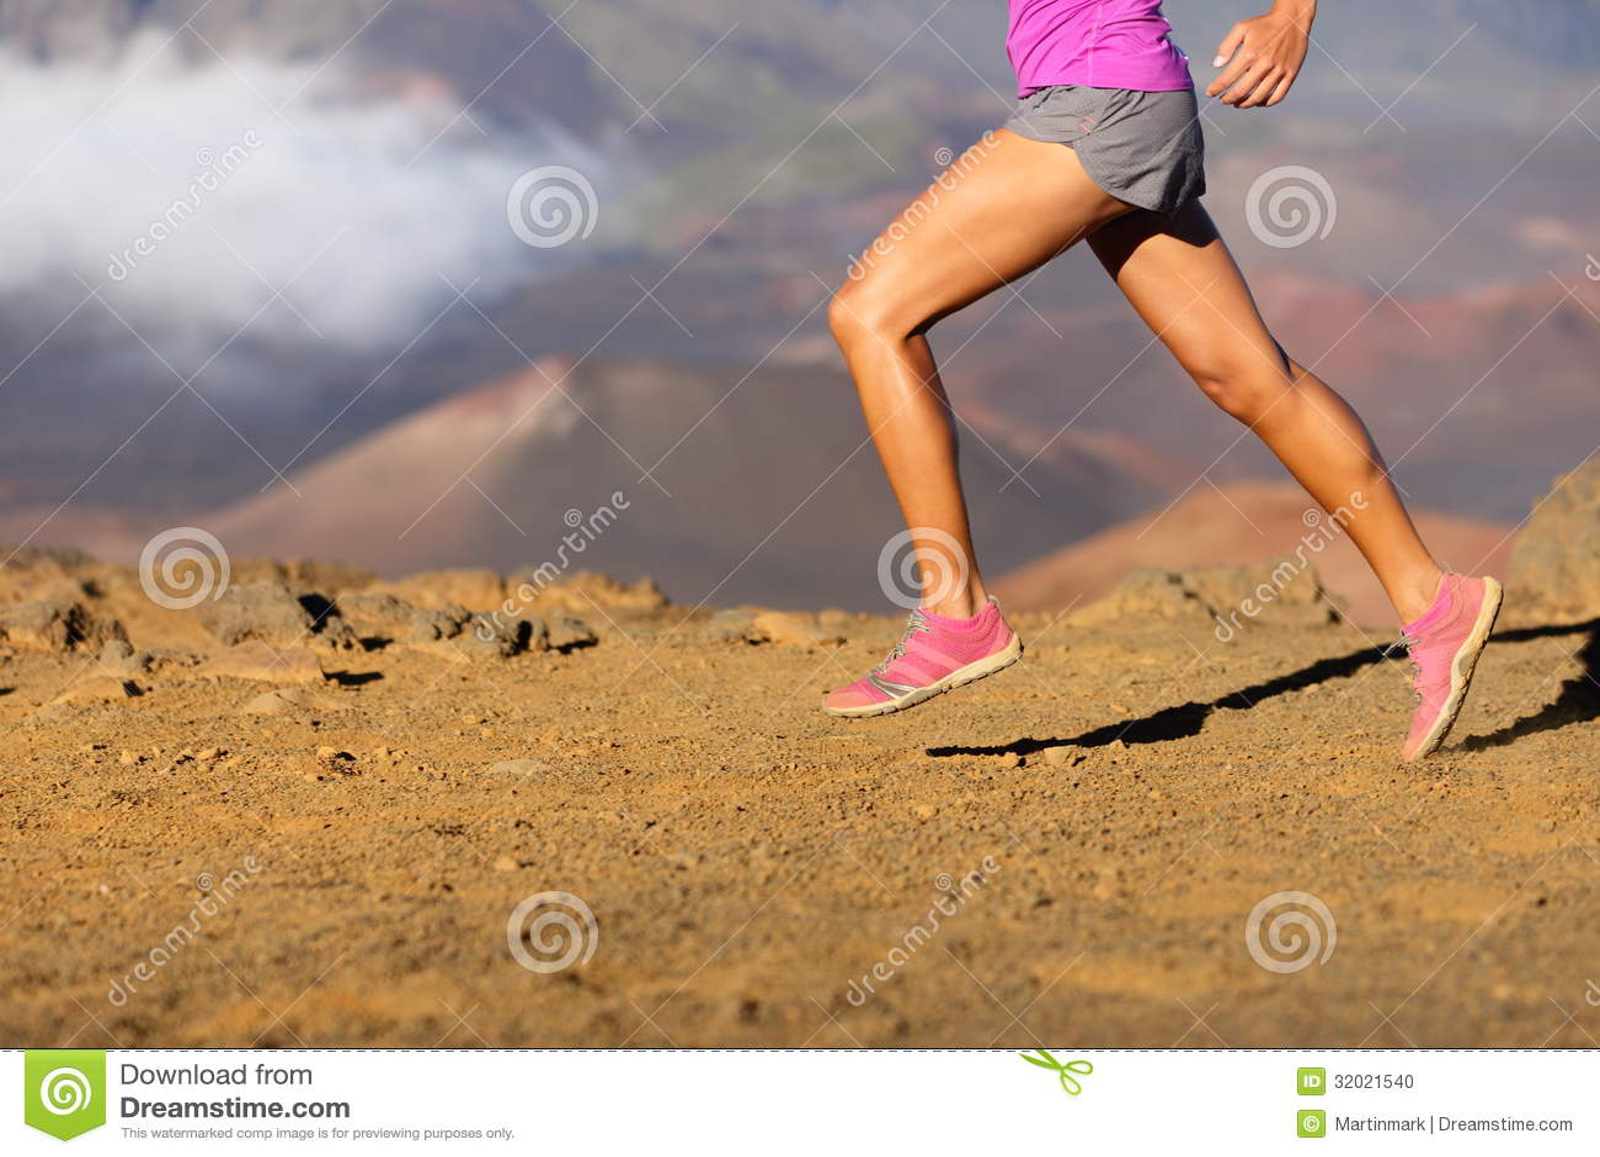 Running Shoes Andlegs